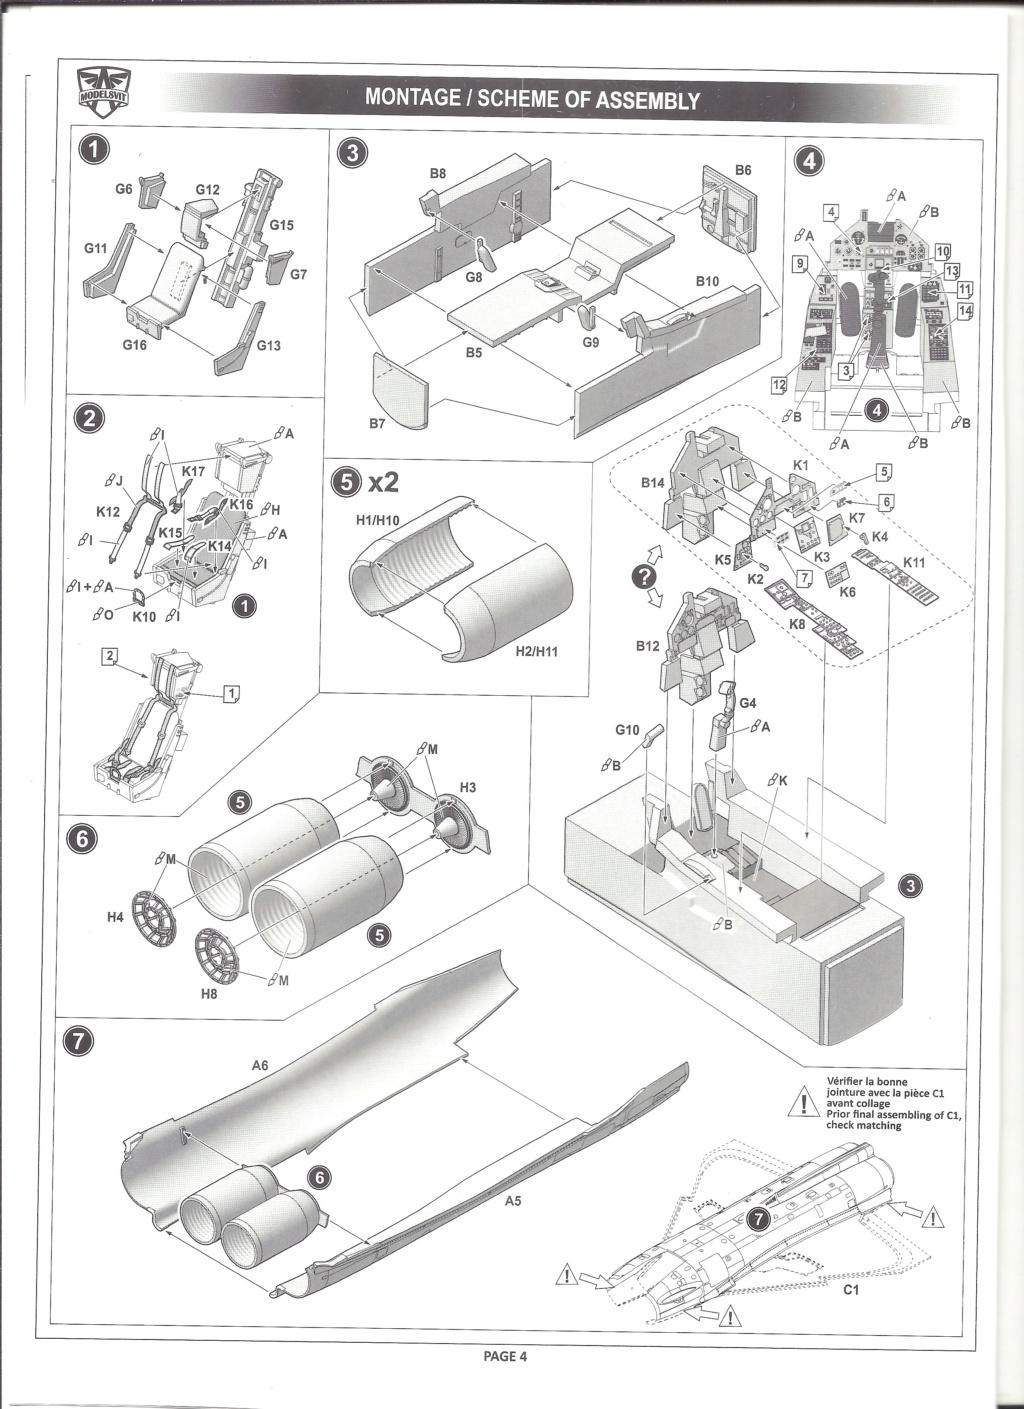 [MODELSVIT] DASSAULT MIRAGE 4000 1/72ème Réf 72052 Notice Models13